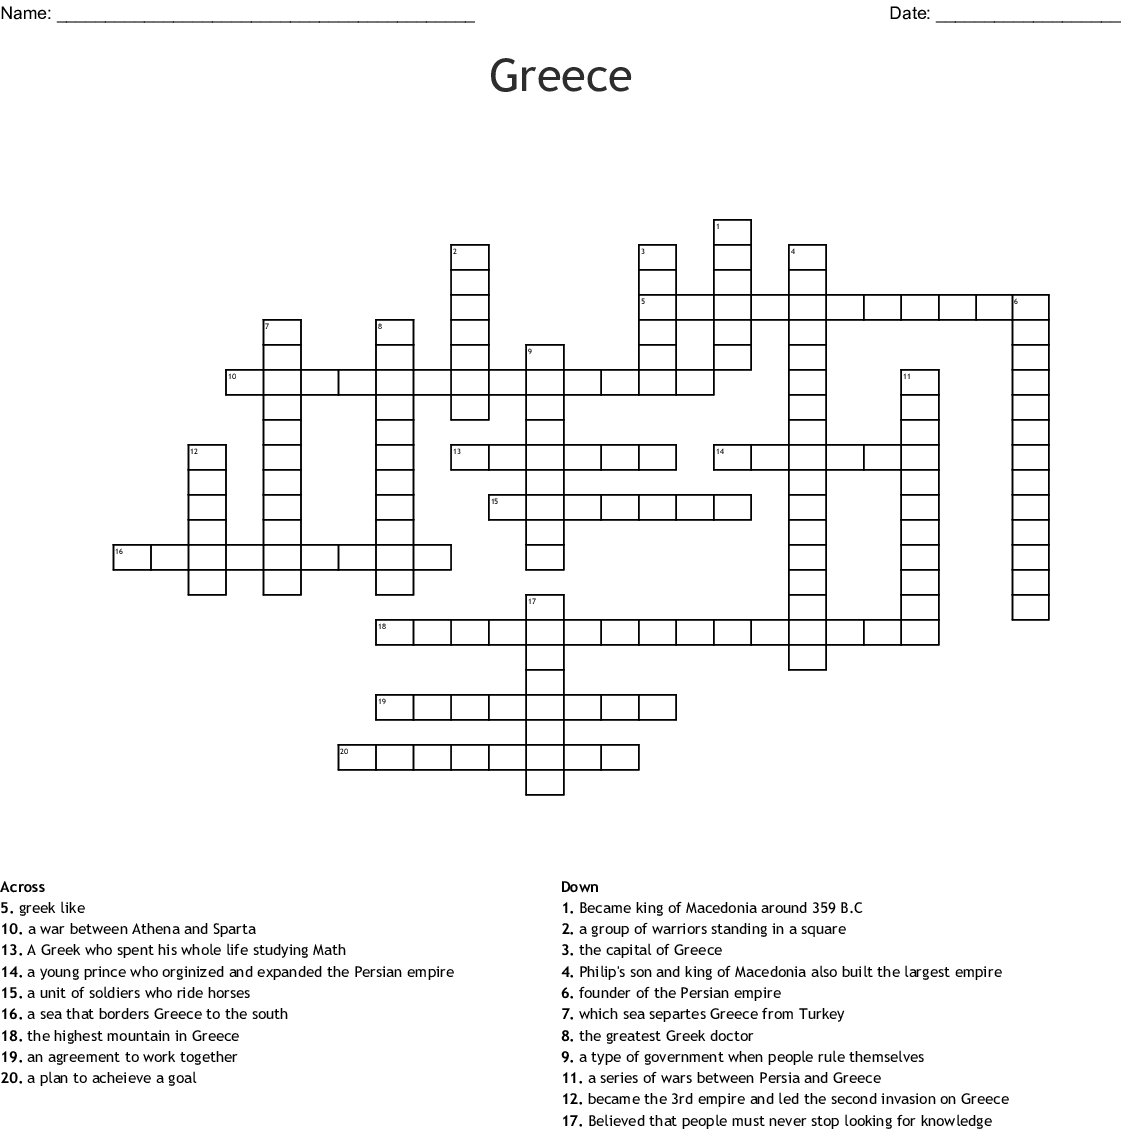 Greece Crossward Puzzle Crossword